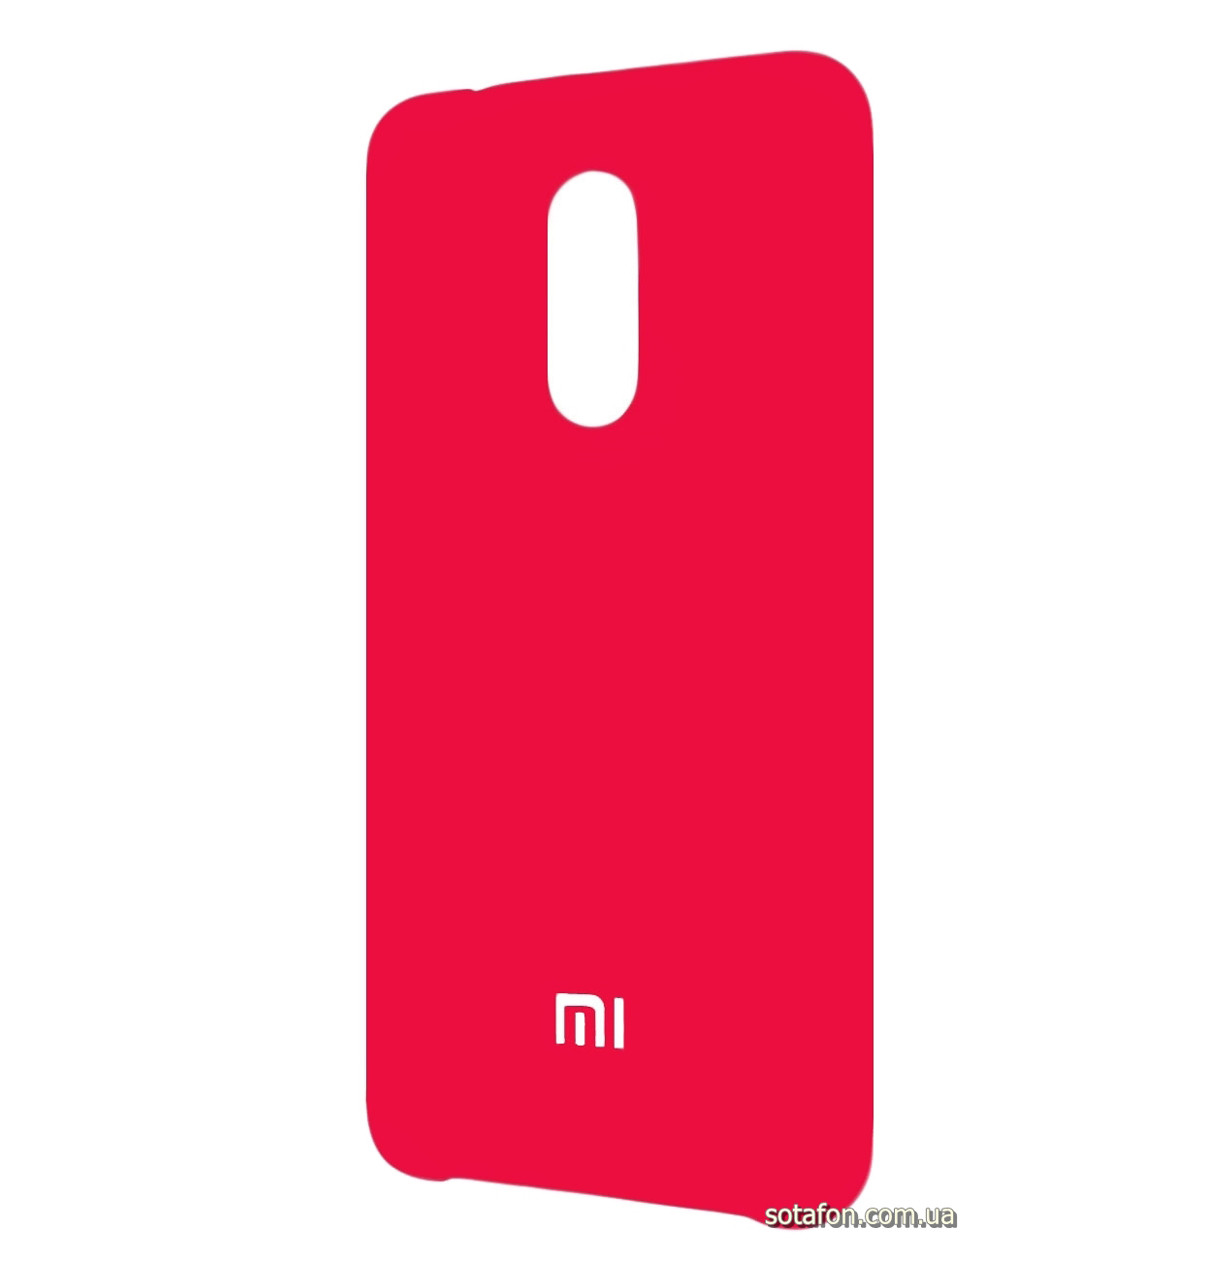 Чехол-накладка Original Silicone case на Xiaomi Redmi 5 Crimson